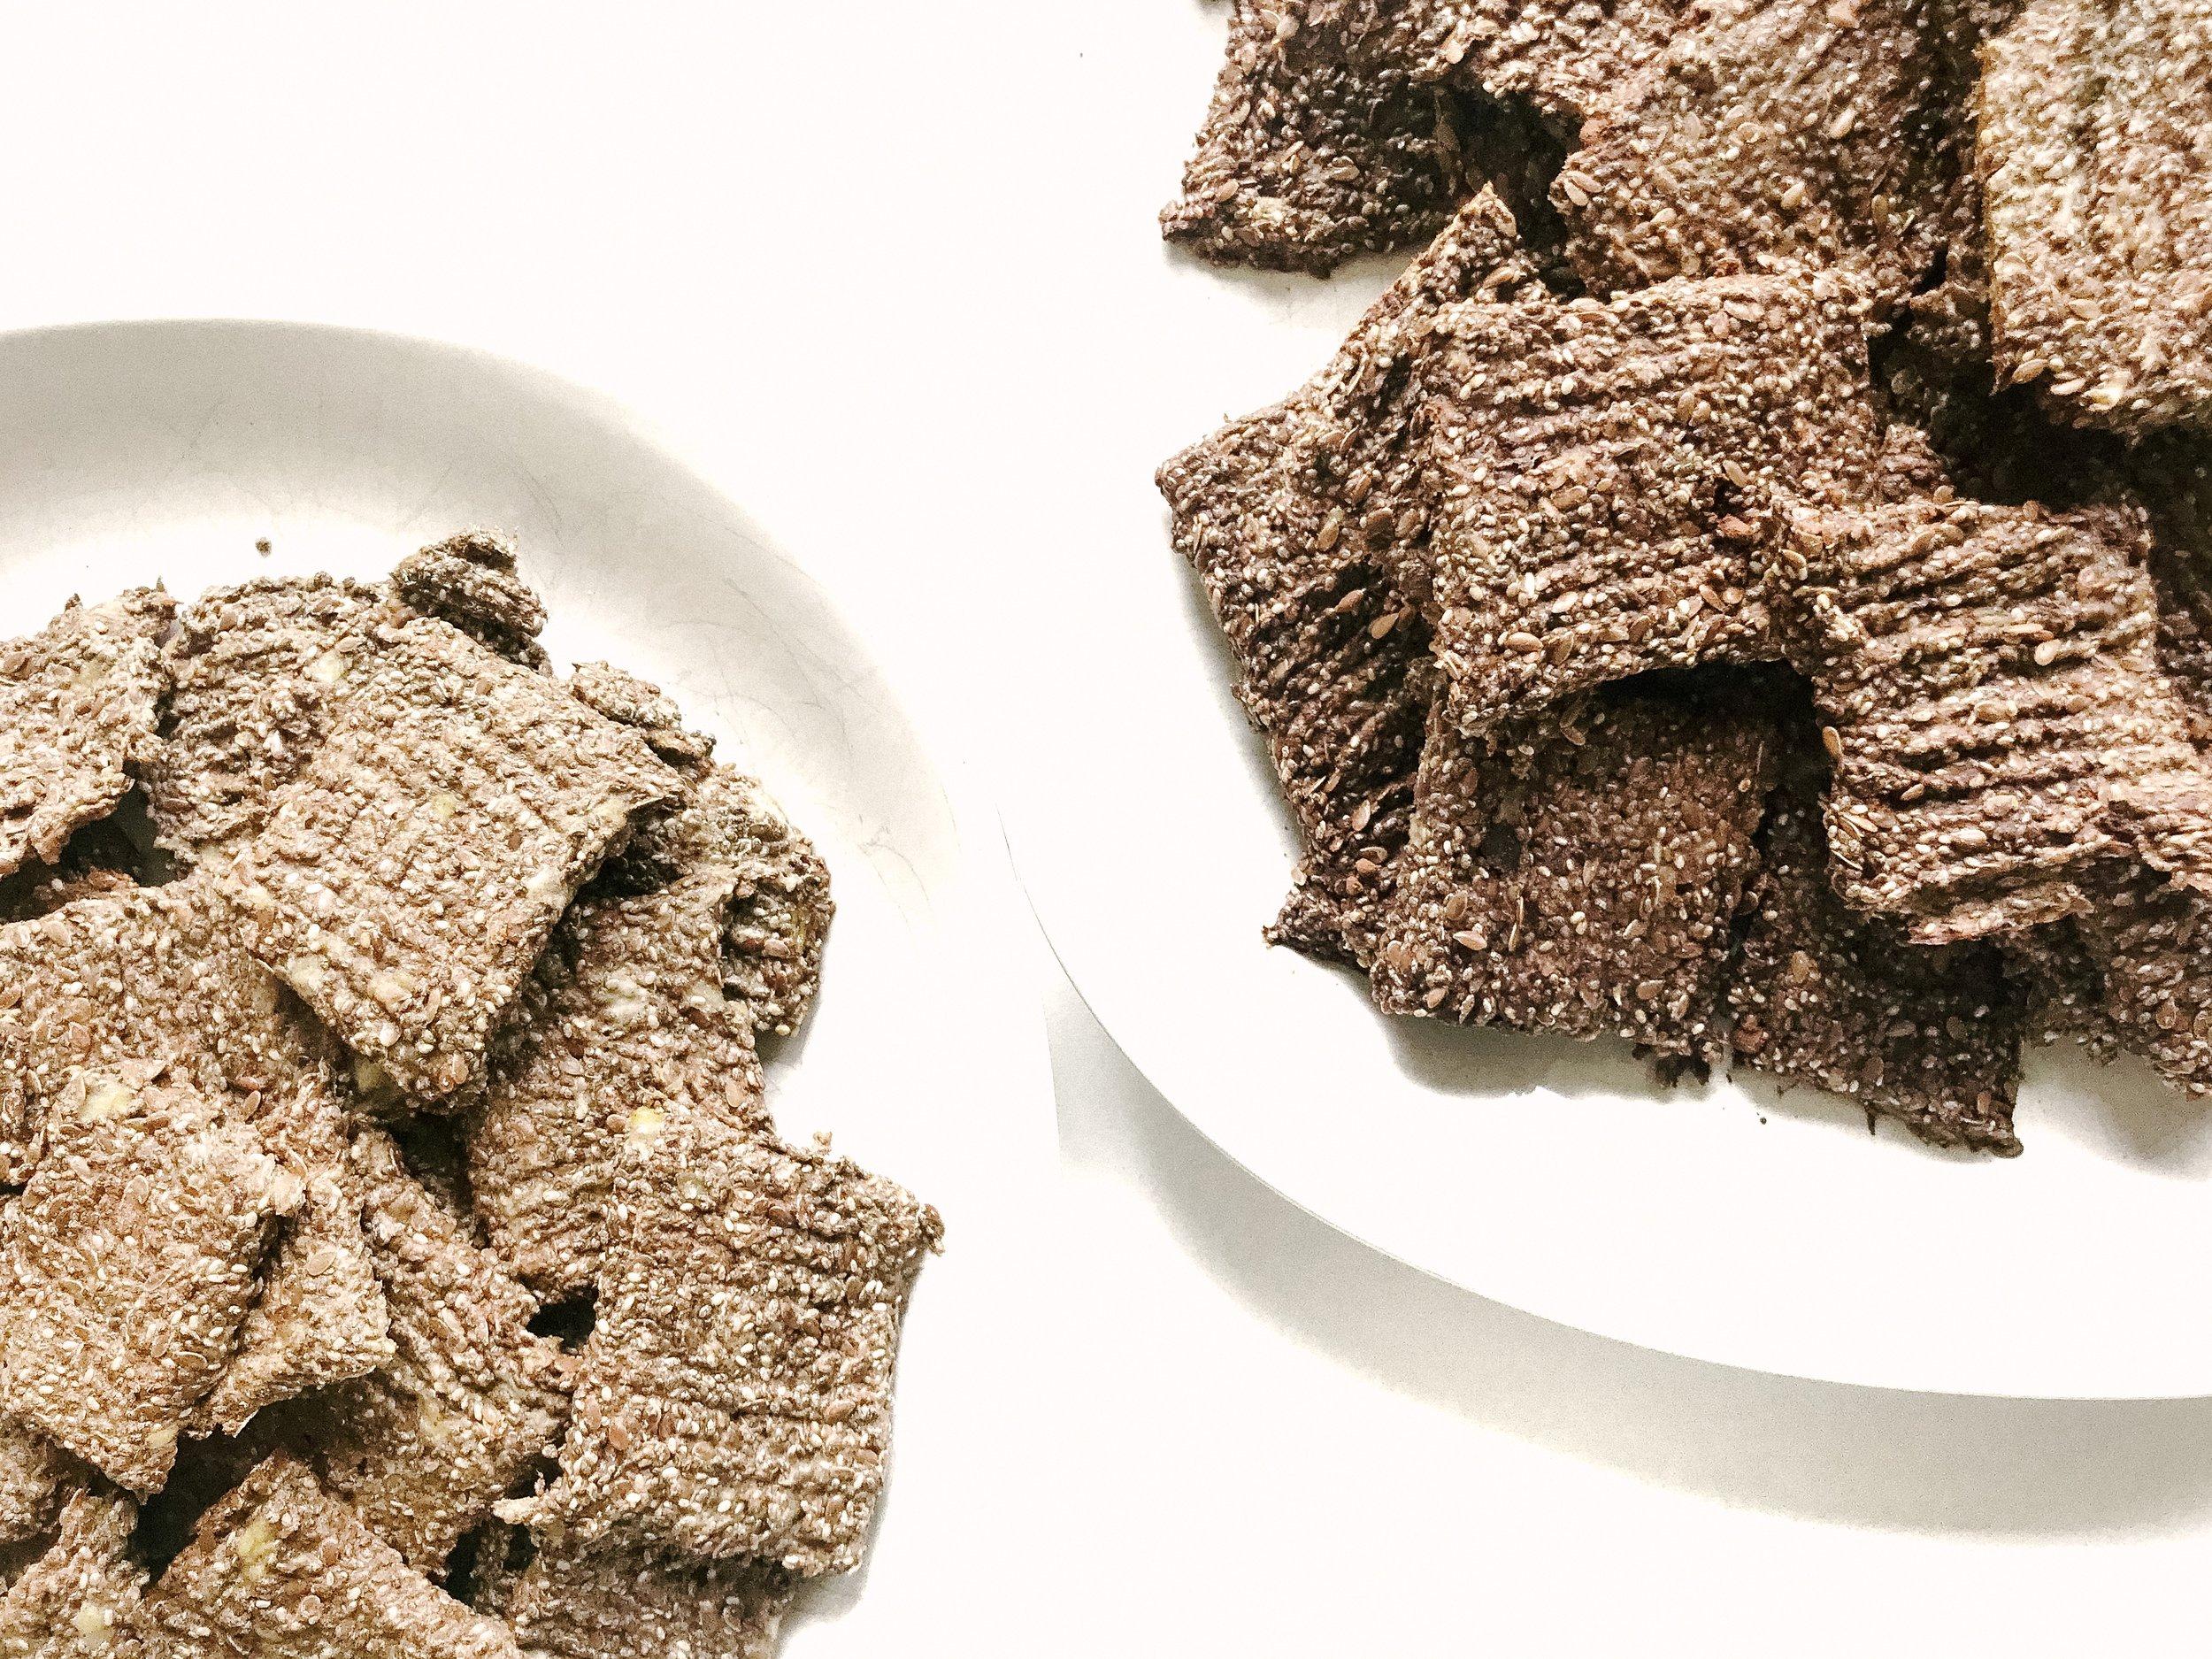 3-Ingredient Banana Chocolate Chia Crisps (Paleo, GAPS, GF, DF, Vegan)